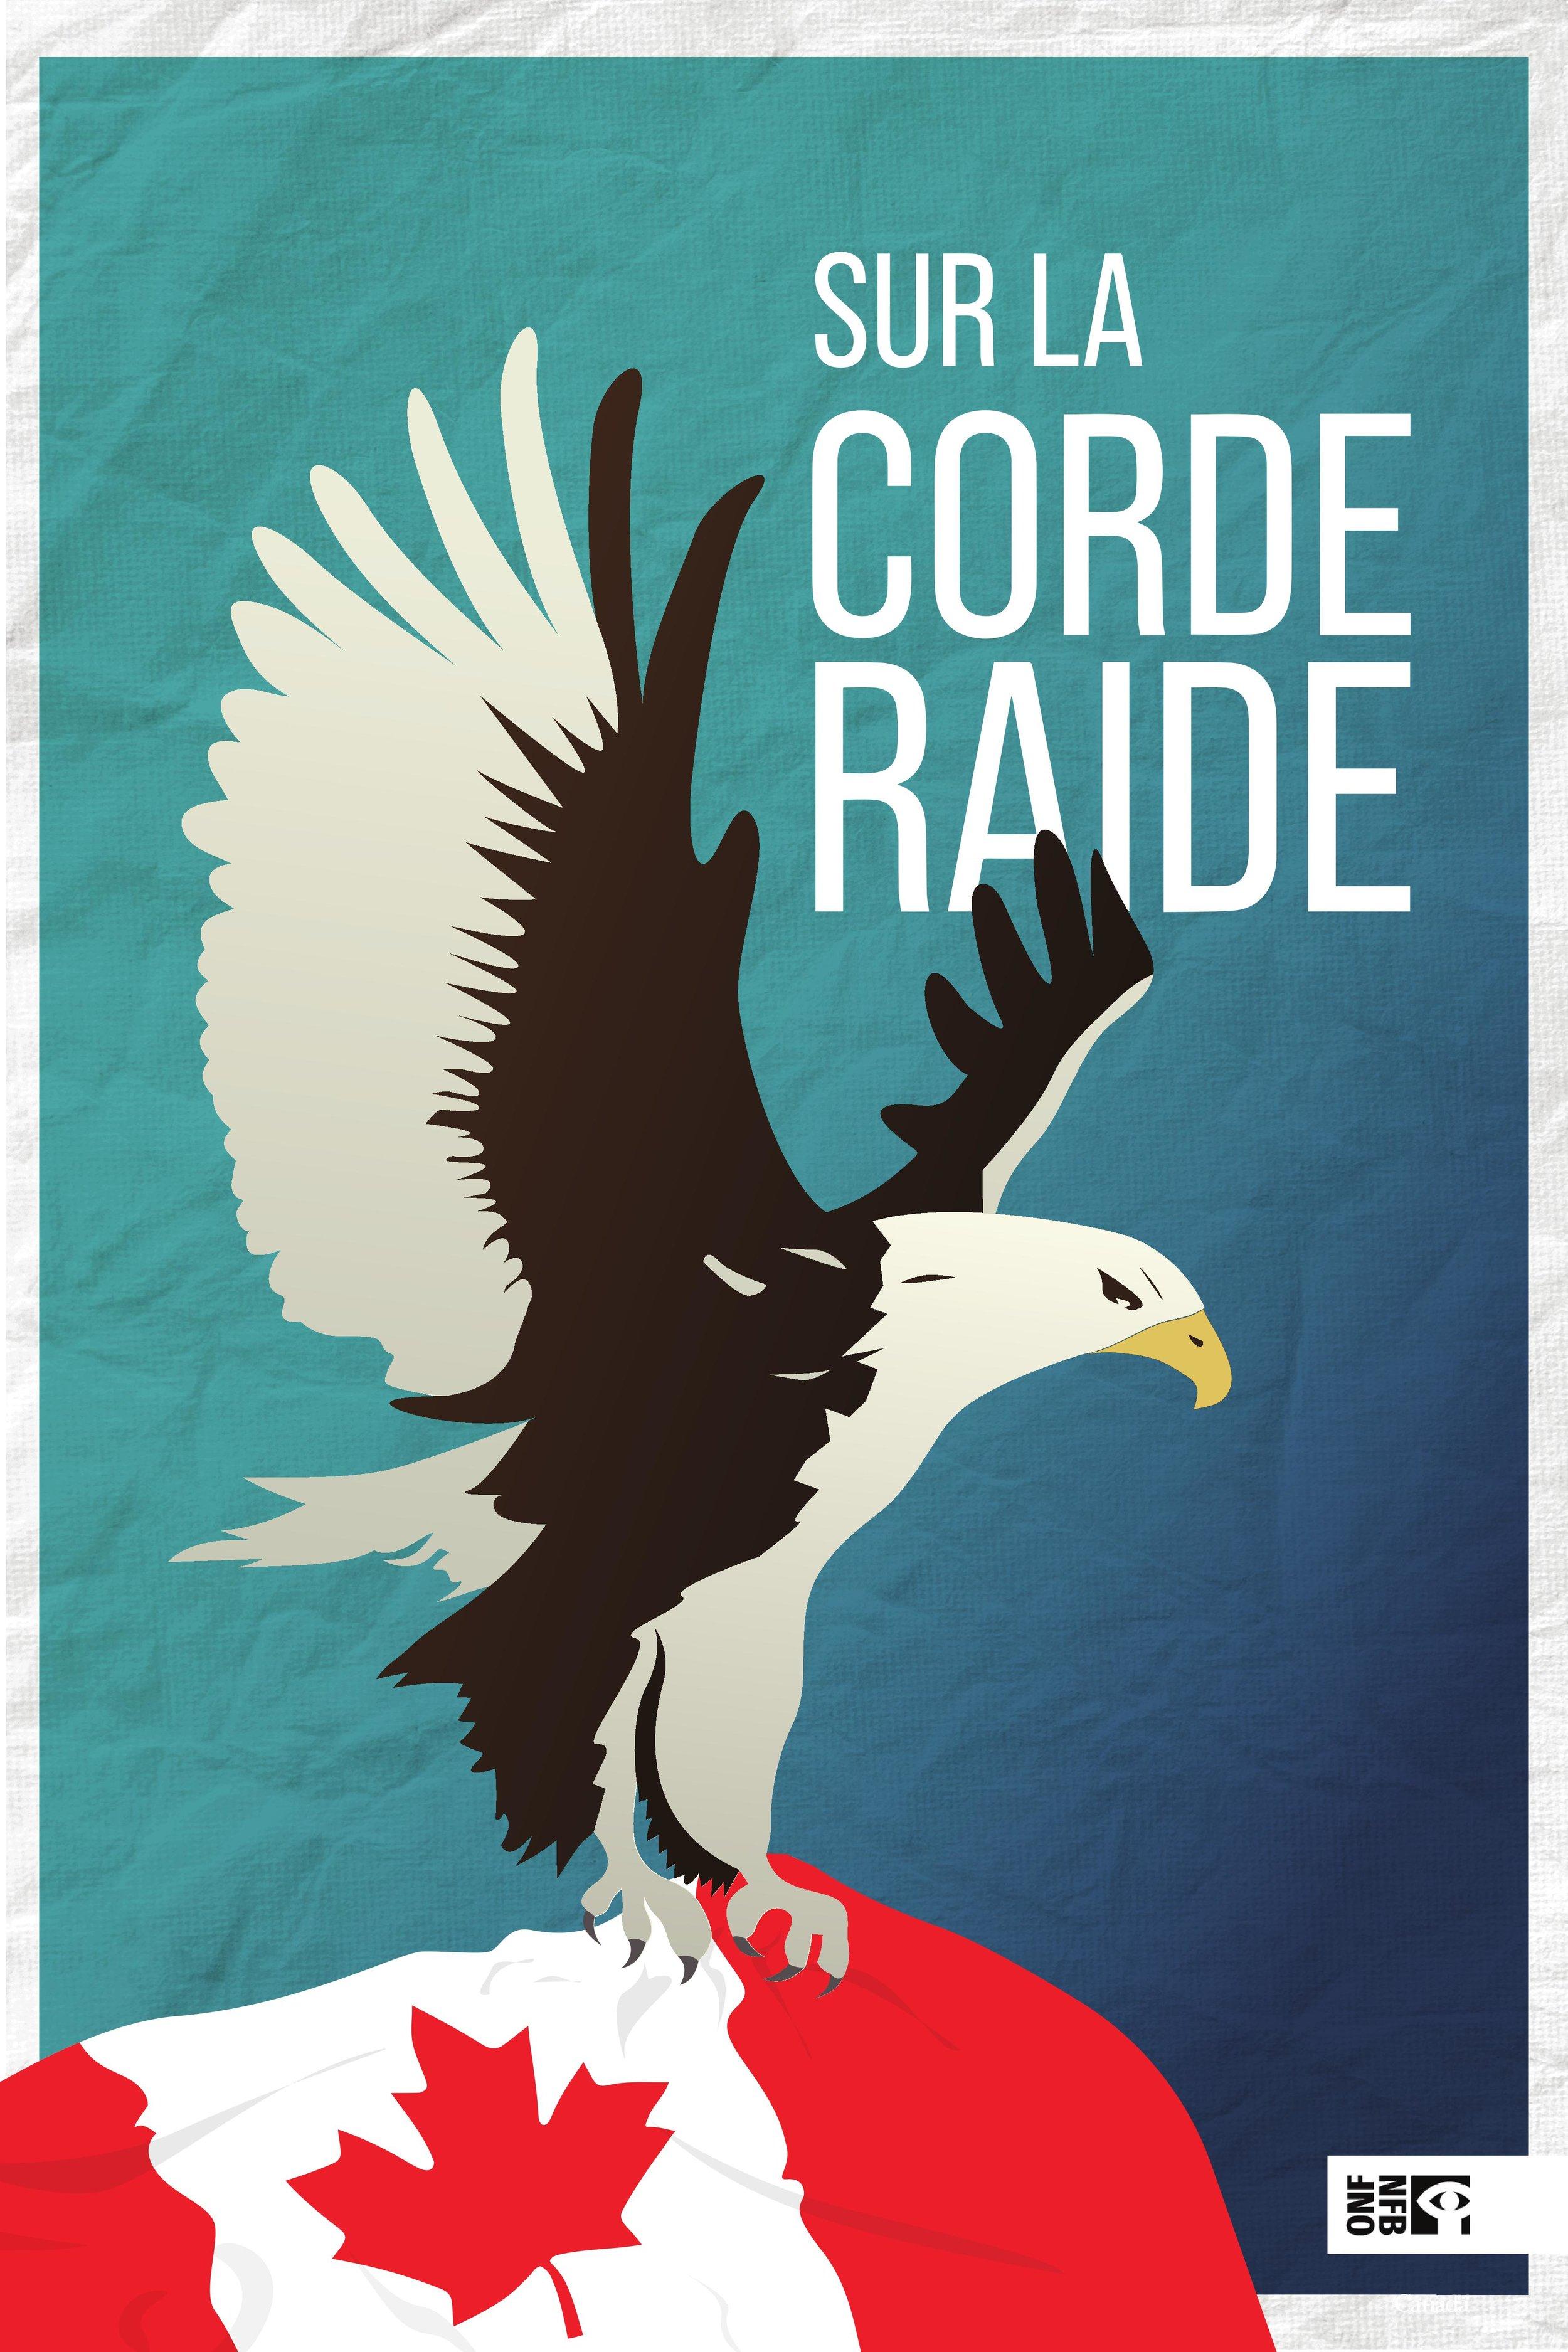 SURLACORDERAIDE-LaCamaraderie-Poster-1mars-01 (1)_00007.jpg